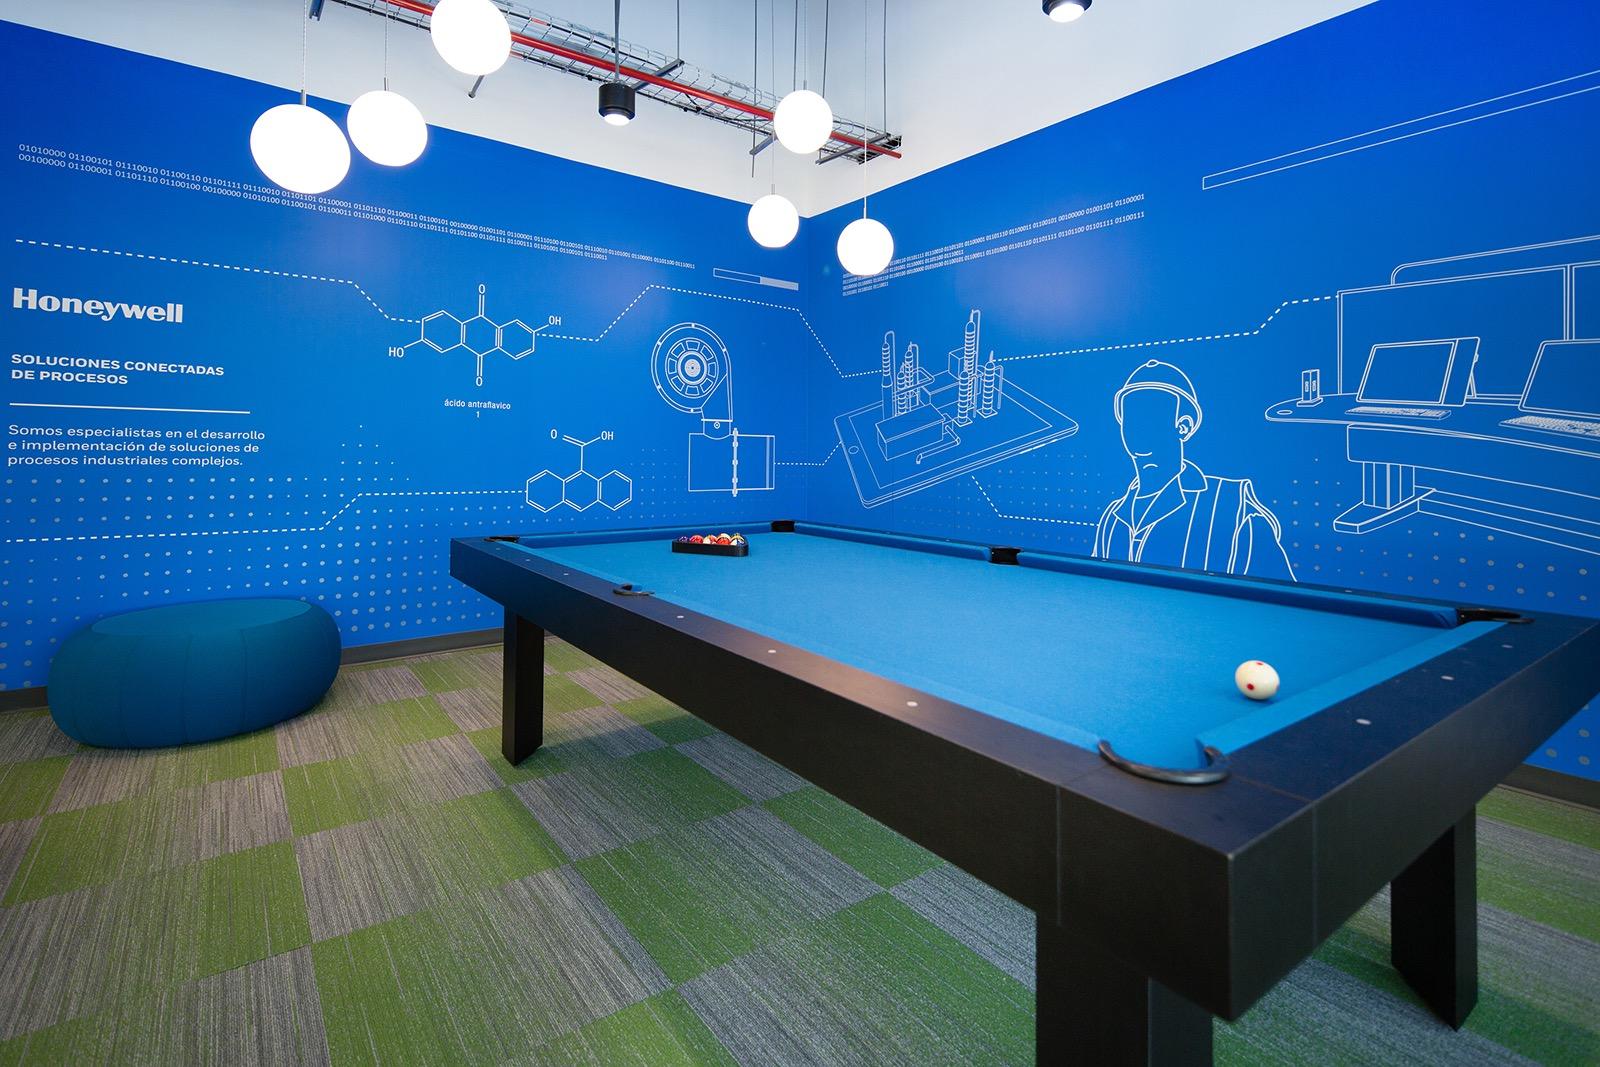 honeywell-technology-solutions-office-8